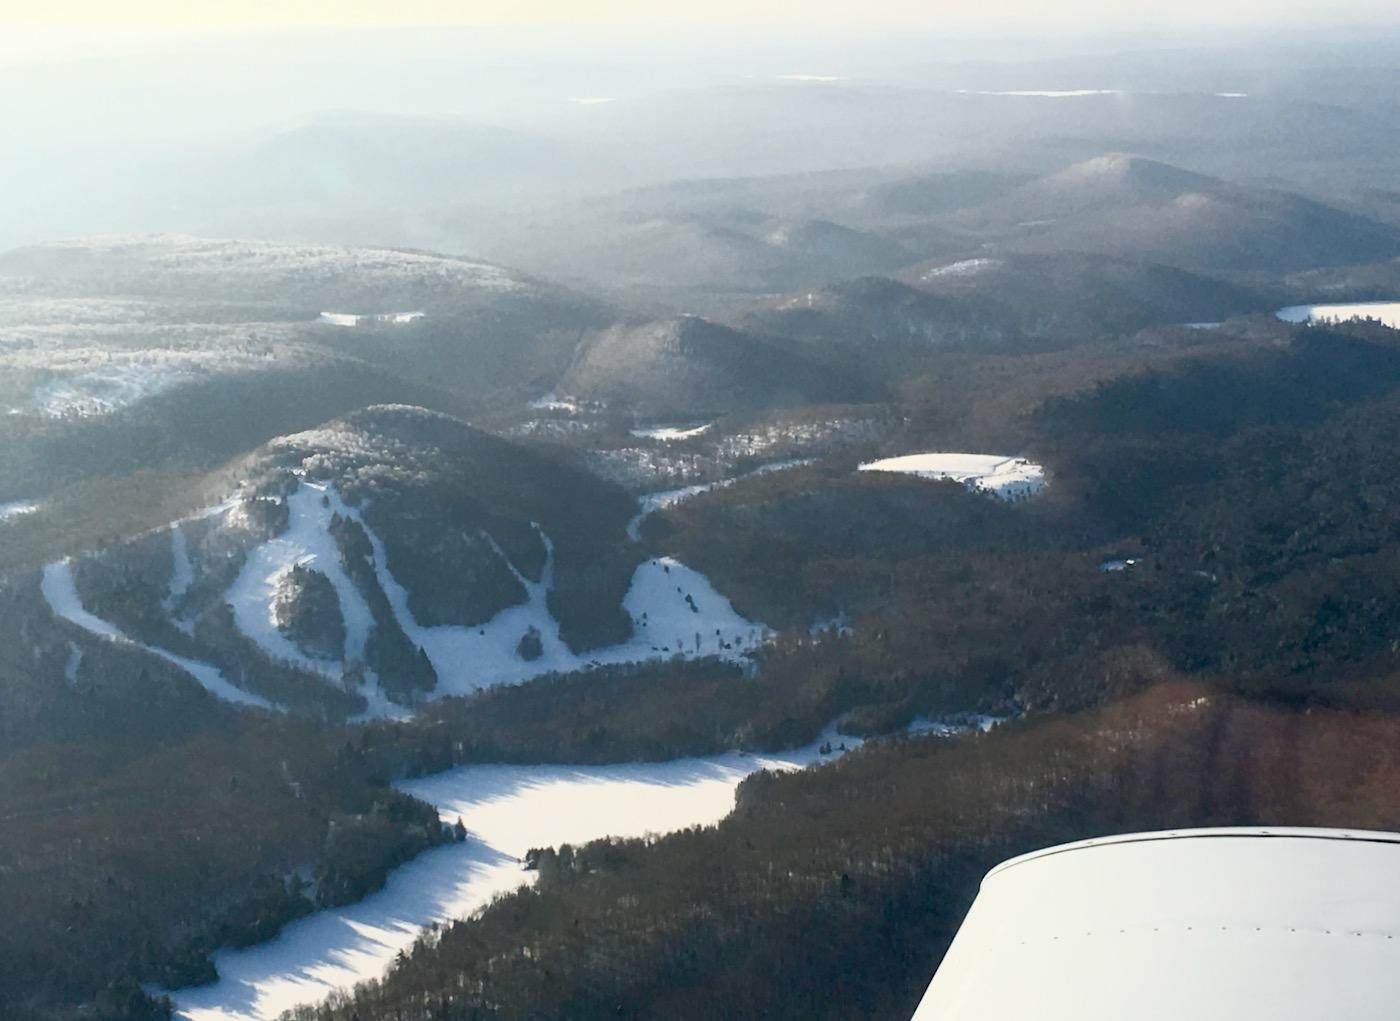 McCauley Mountain aerial